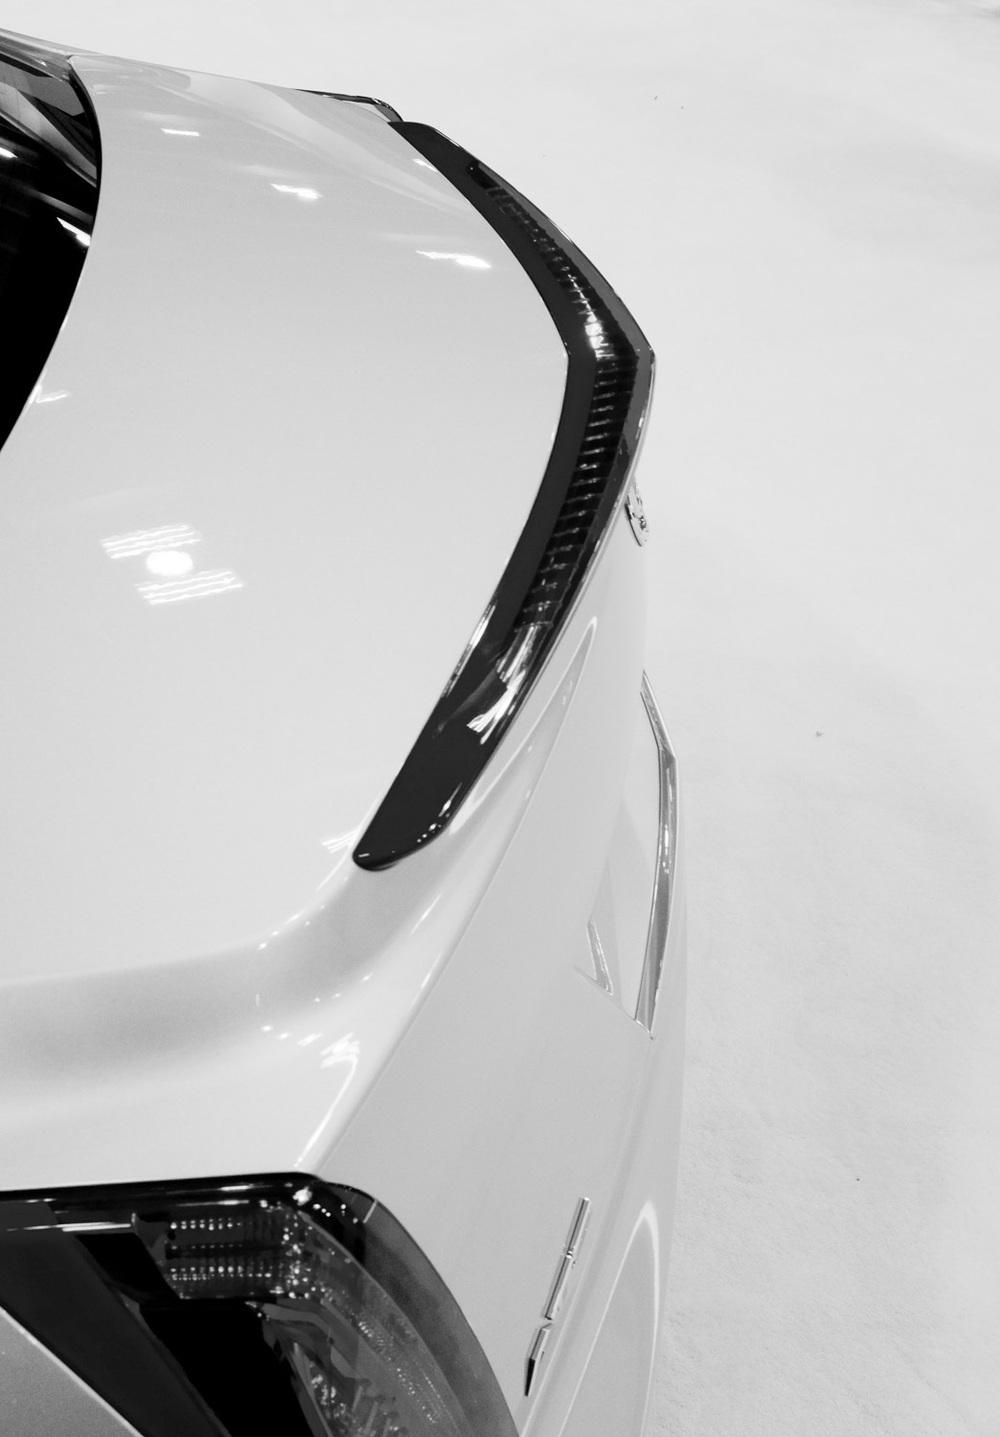 Cadillac Rear